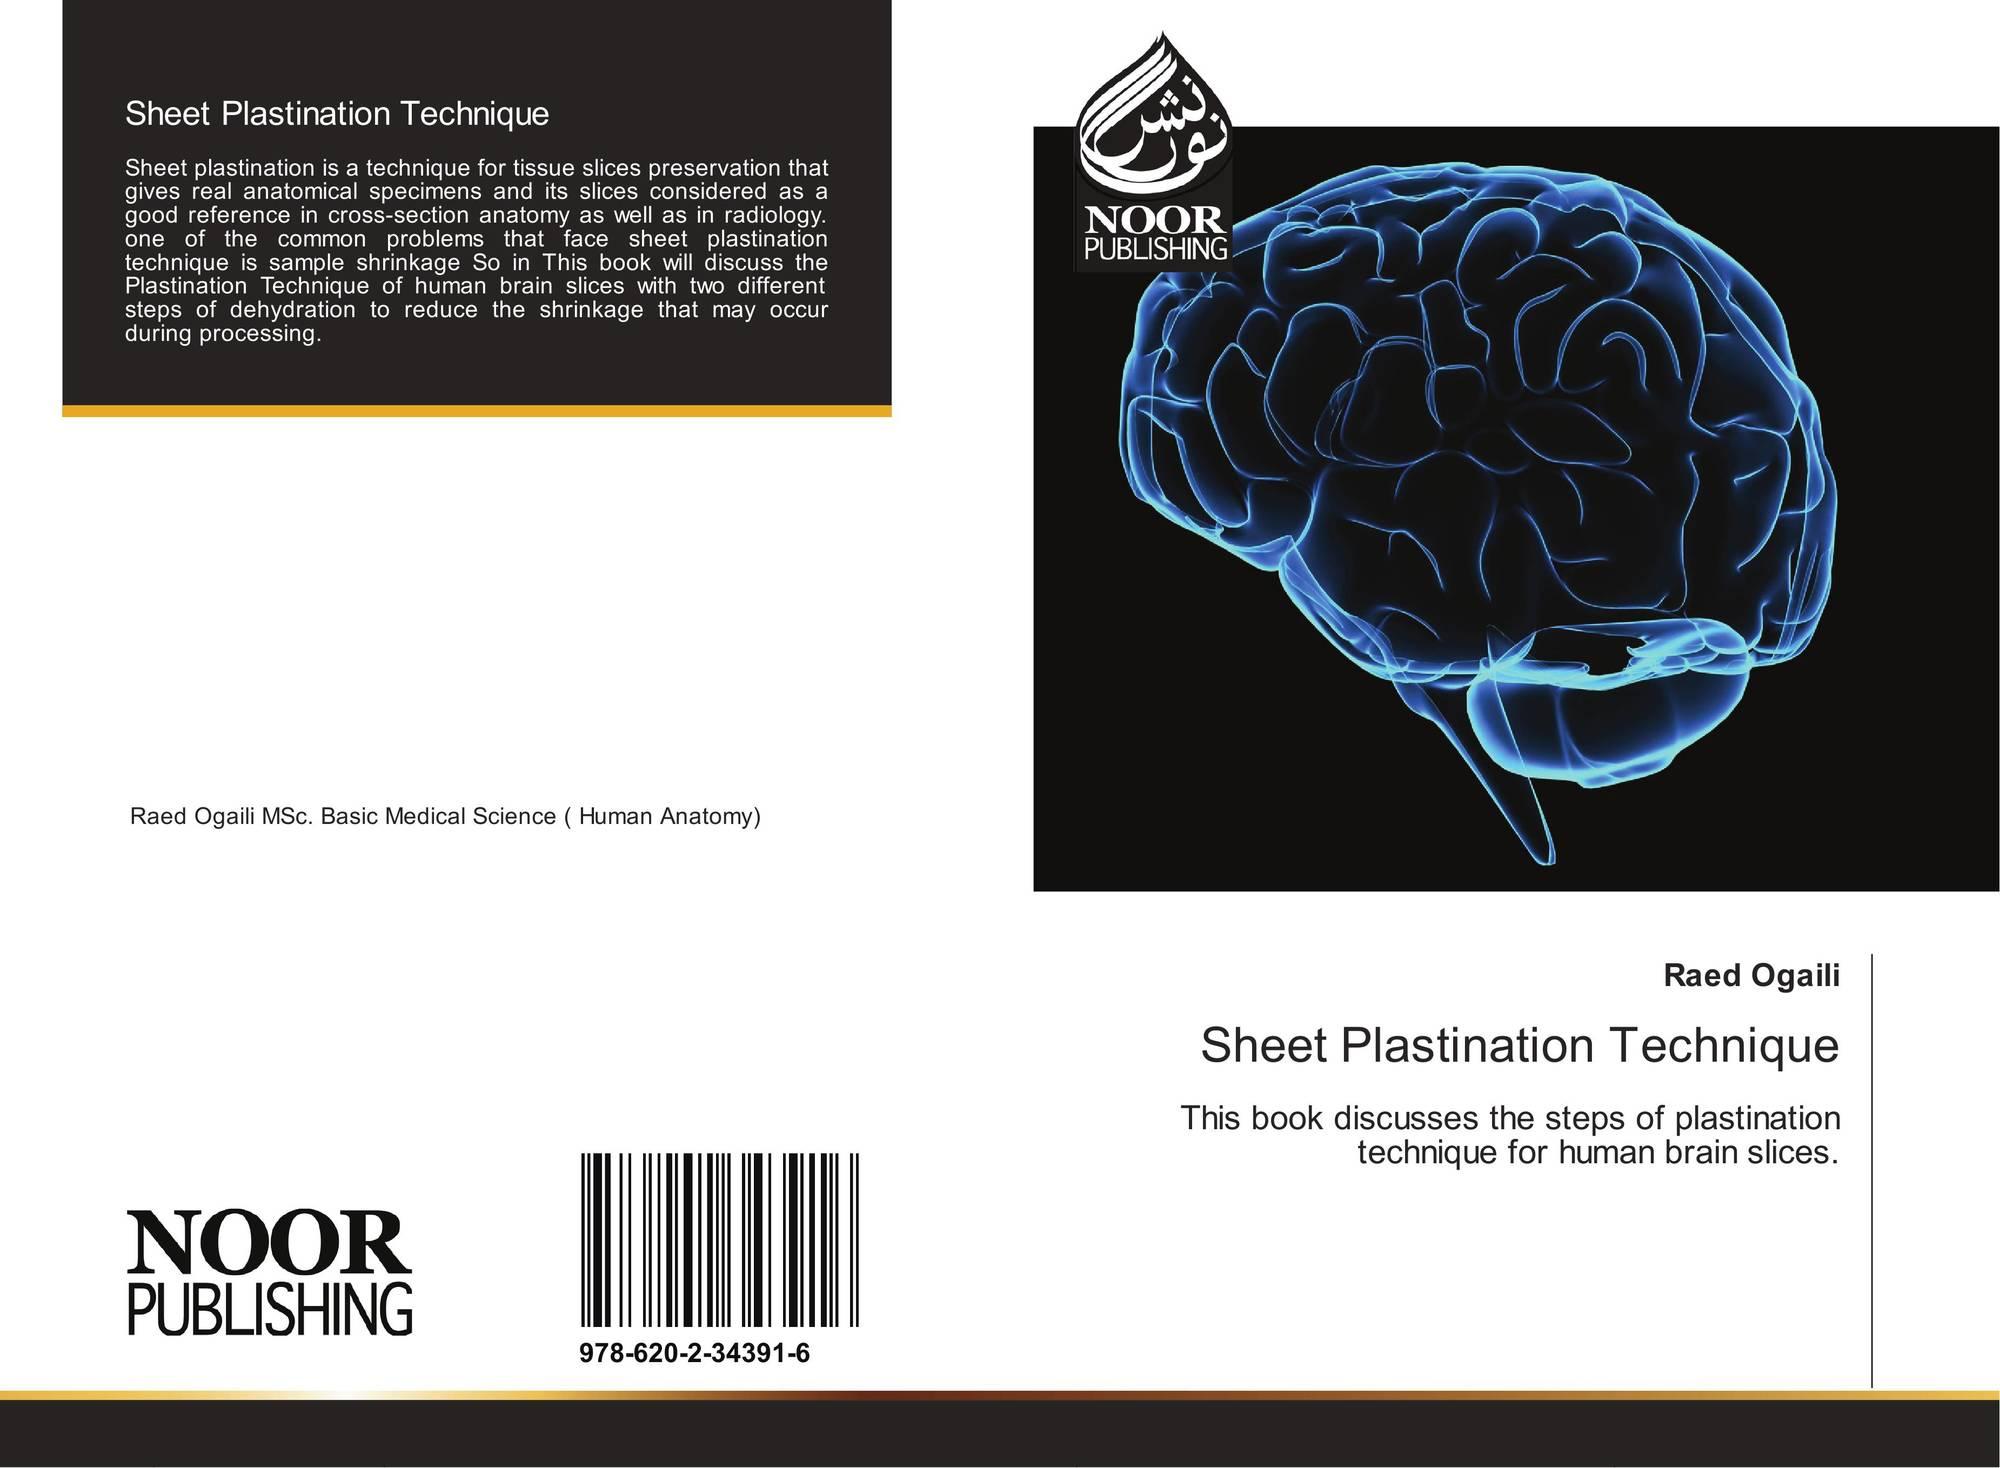 Sheet Plastination Technique, 978-620-2-34391-6, 6202343915 ...